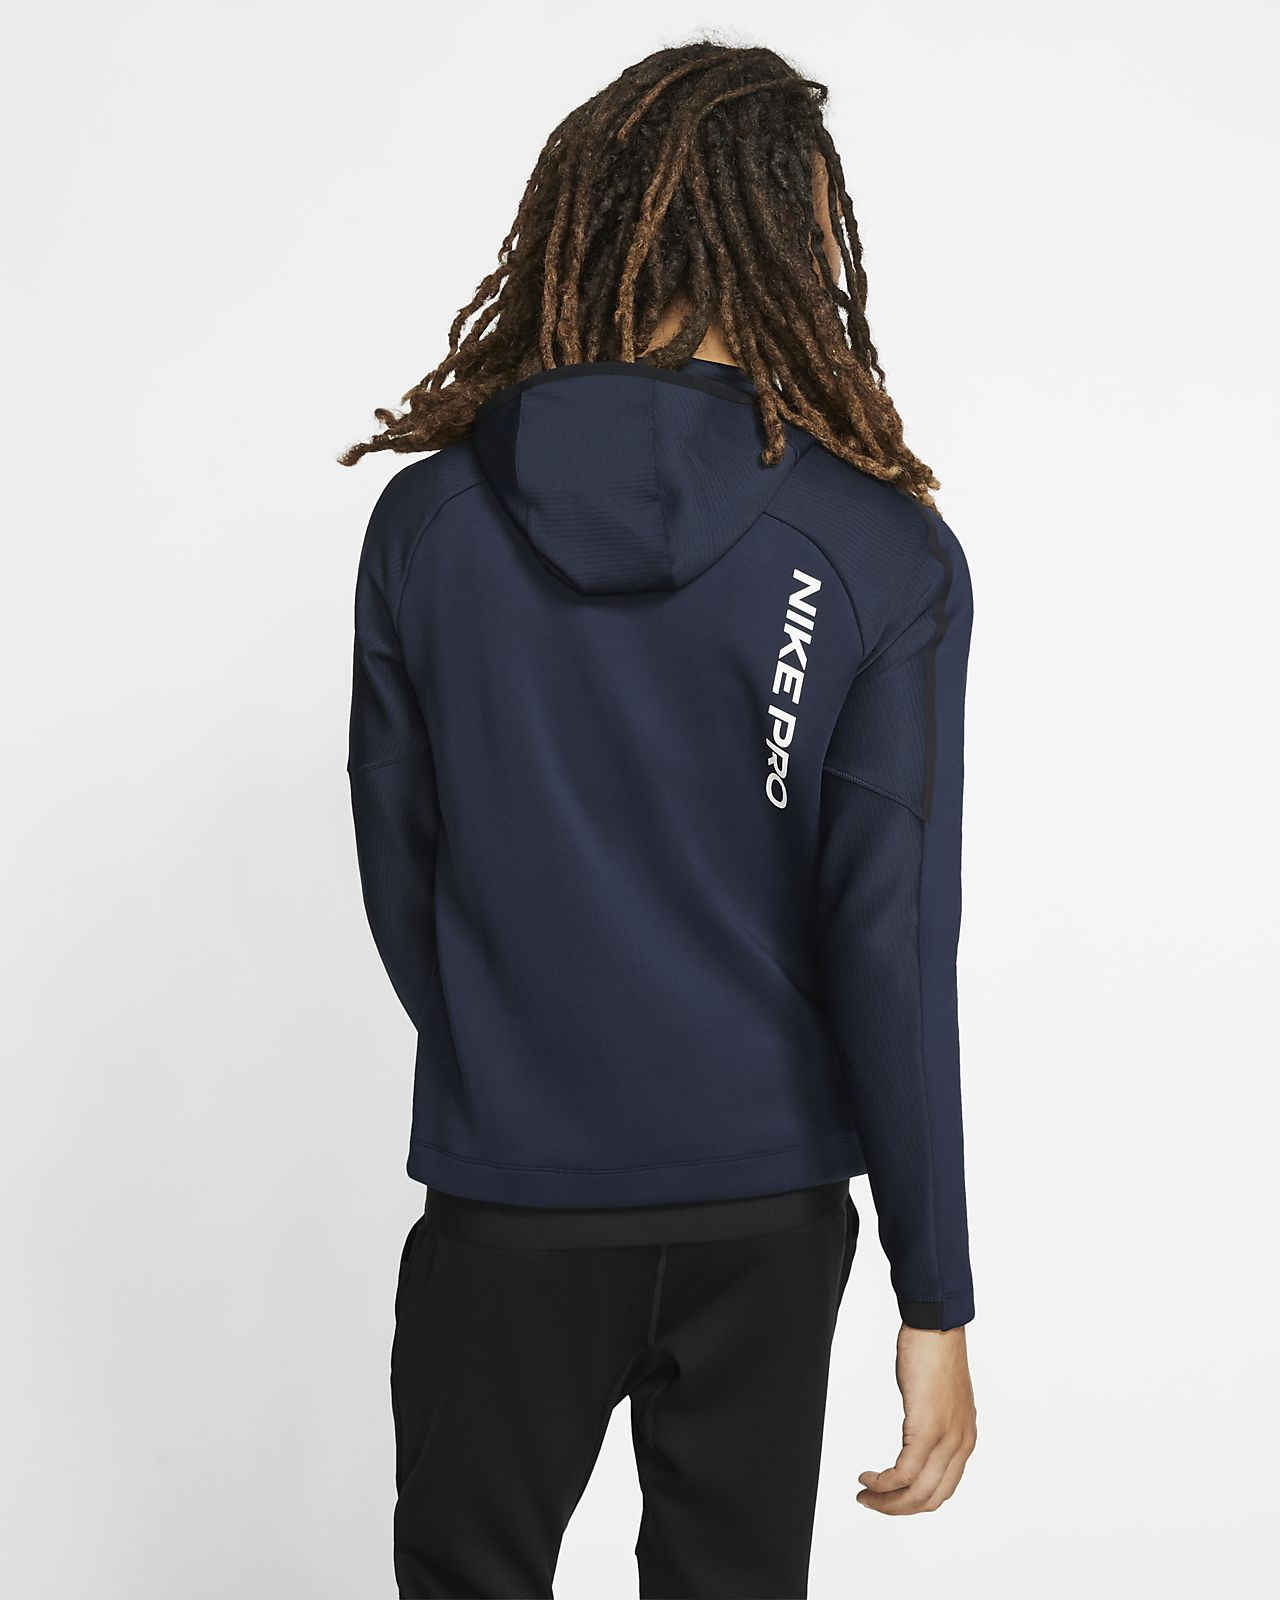 50% off ! Ort Frauen weiß Oberteile Nike Hoody Sportswear